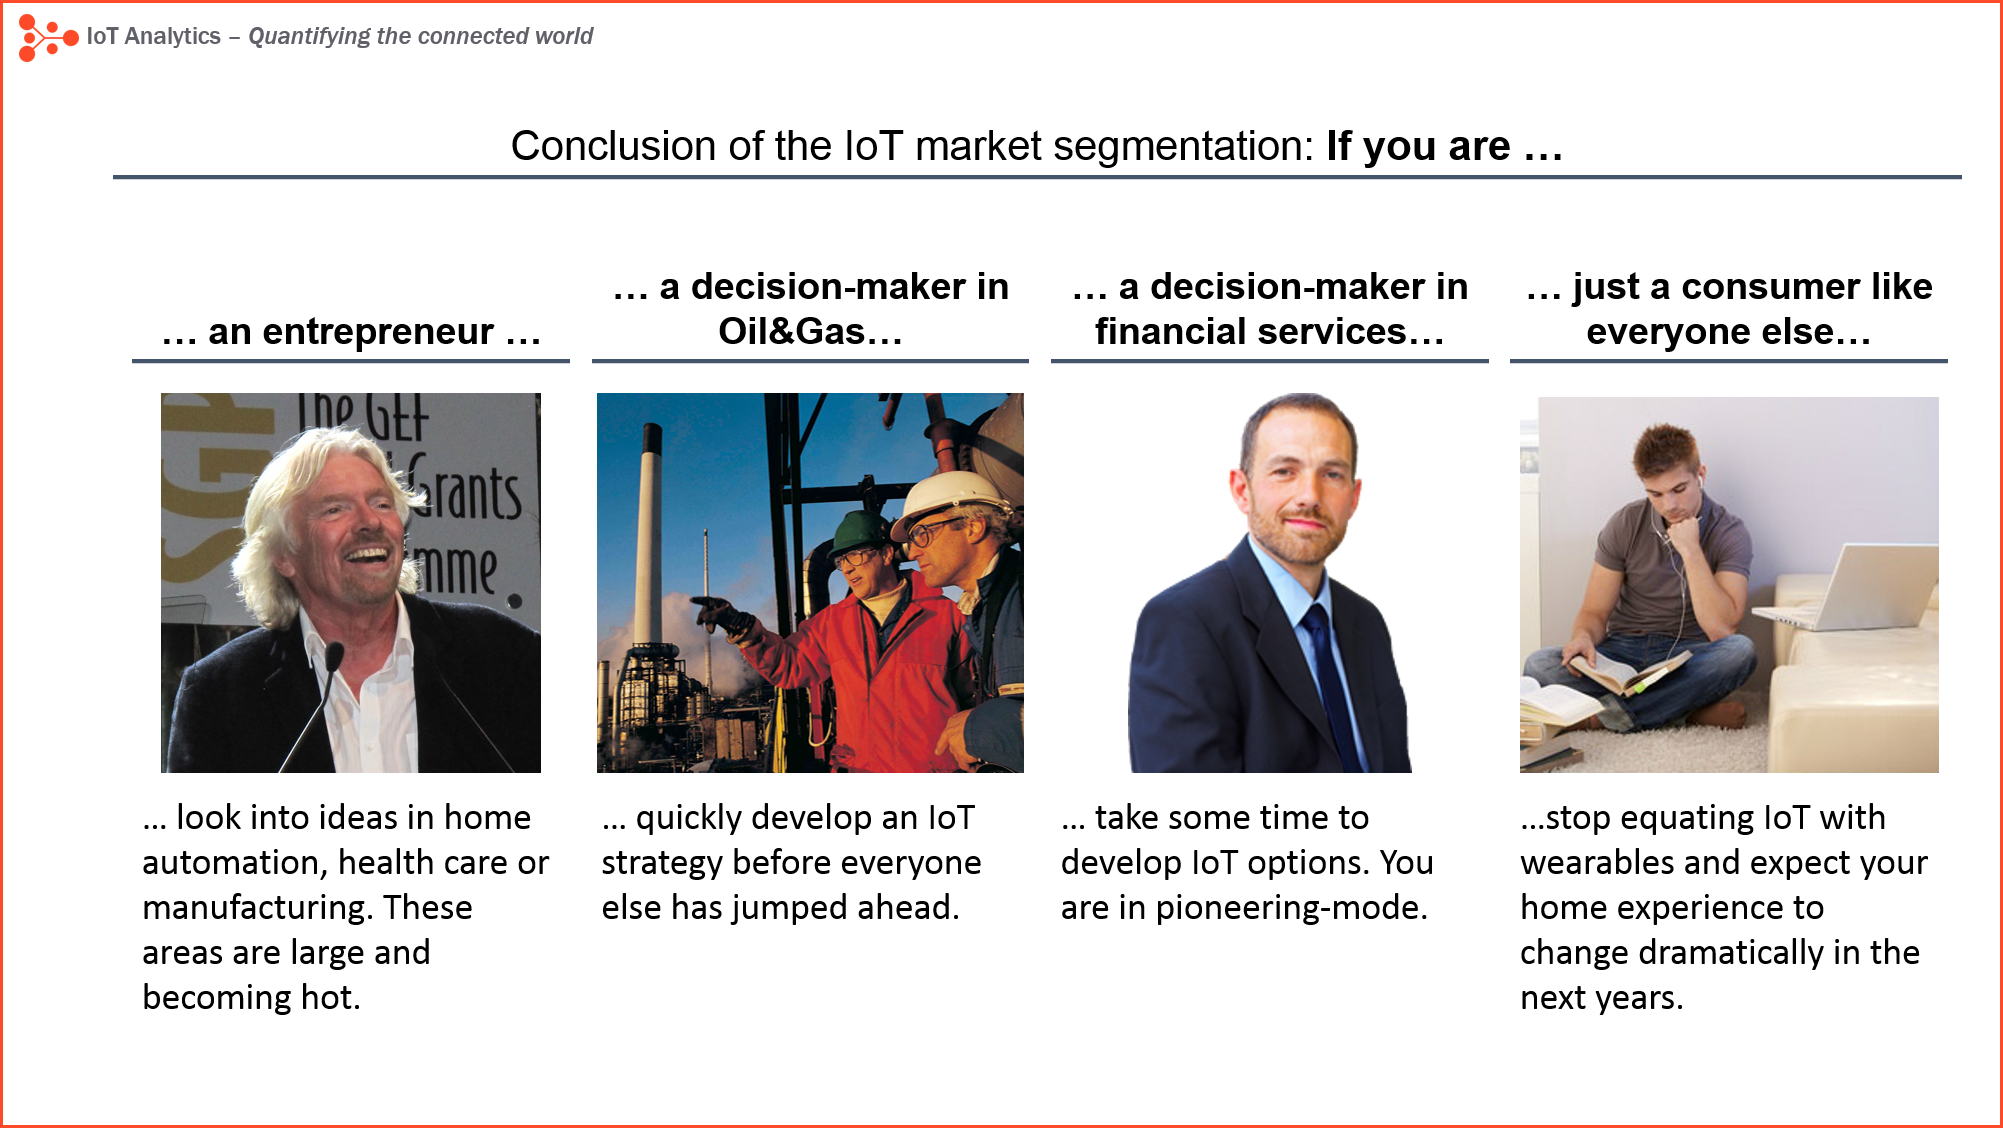 IoT market segmentation conclusion